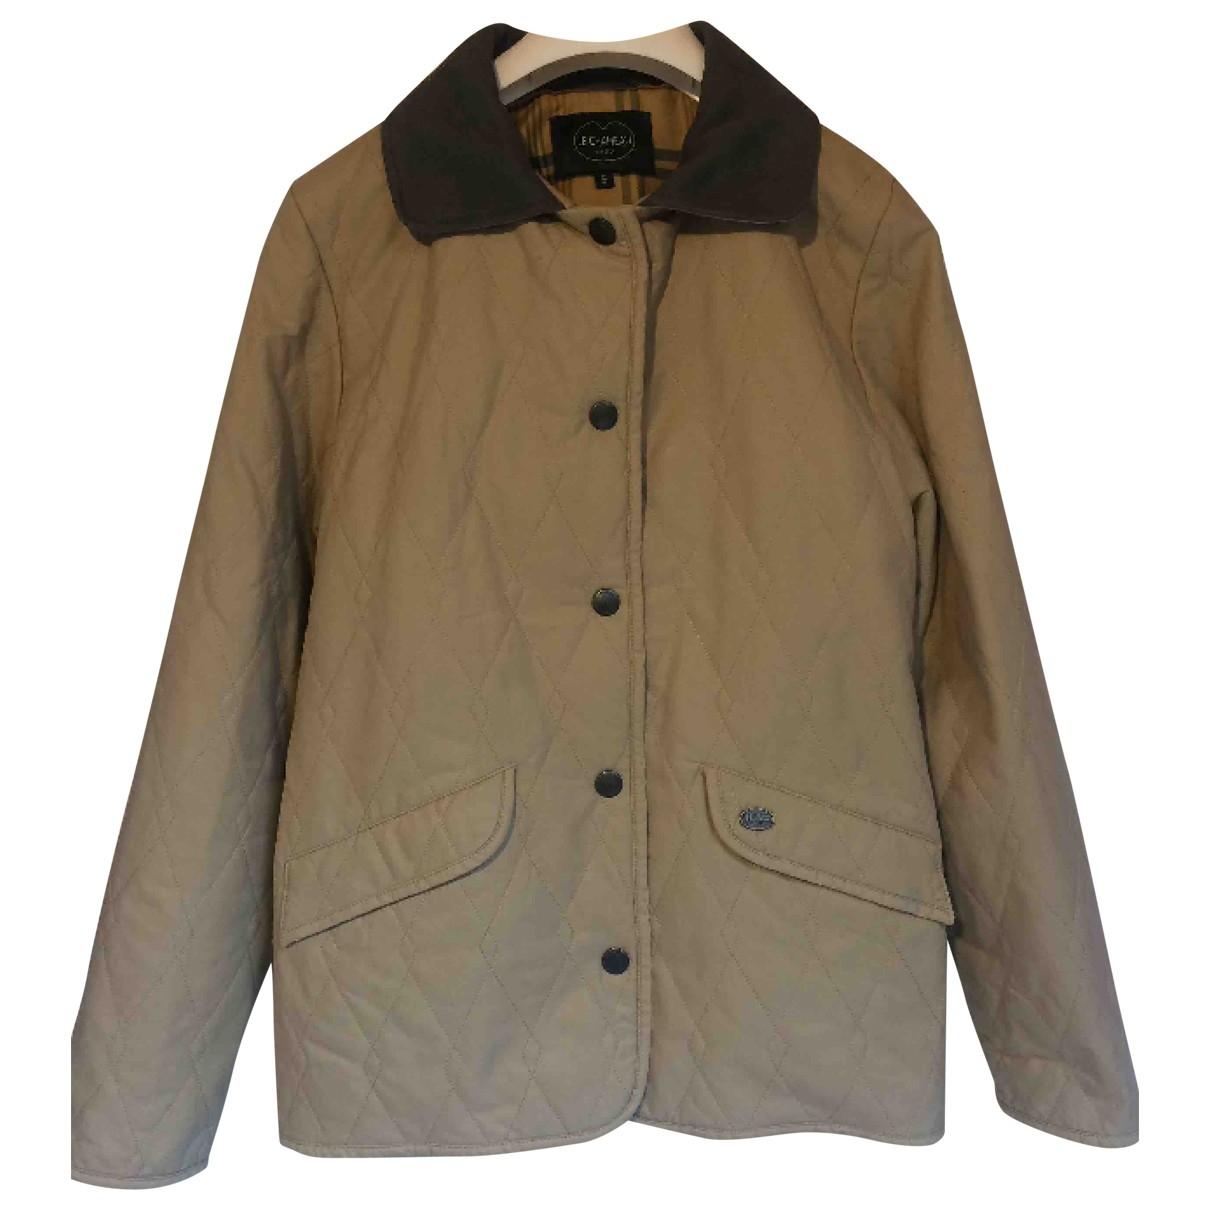 Le Chameau \N Beige Cotton jacket for Women S International